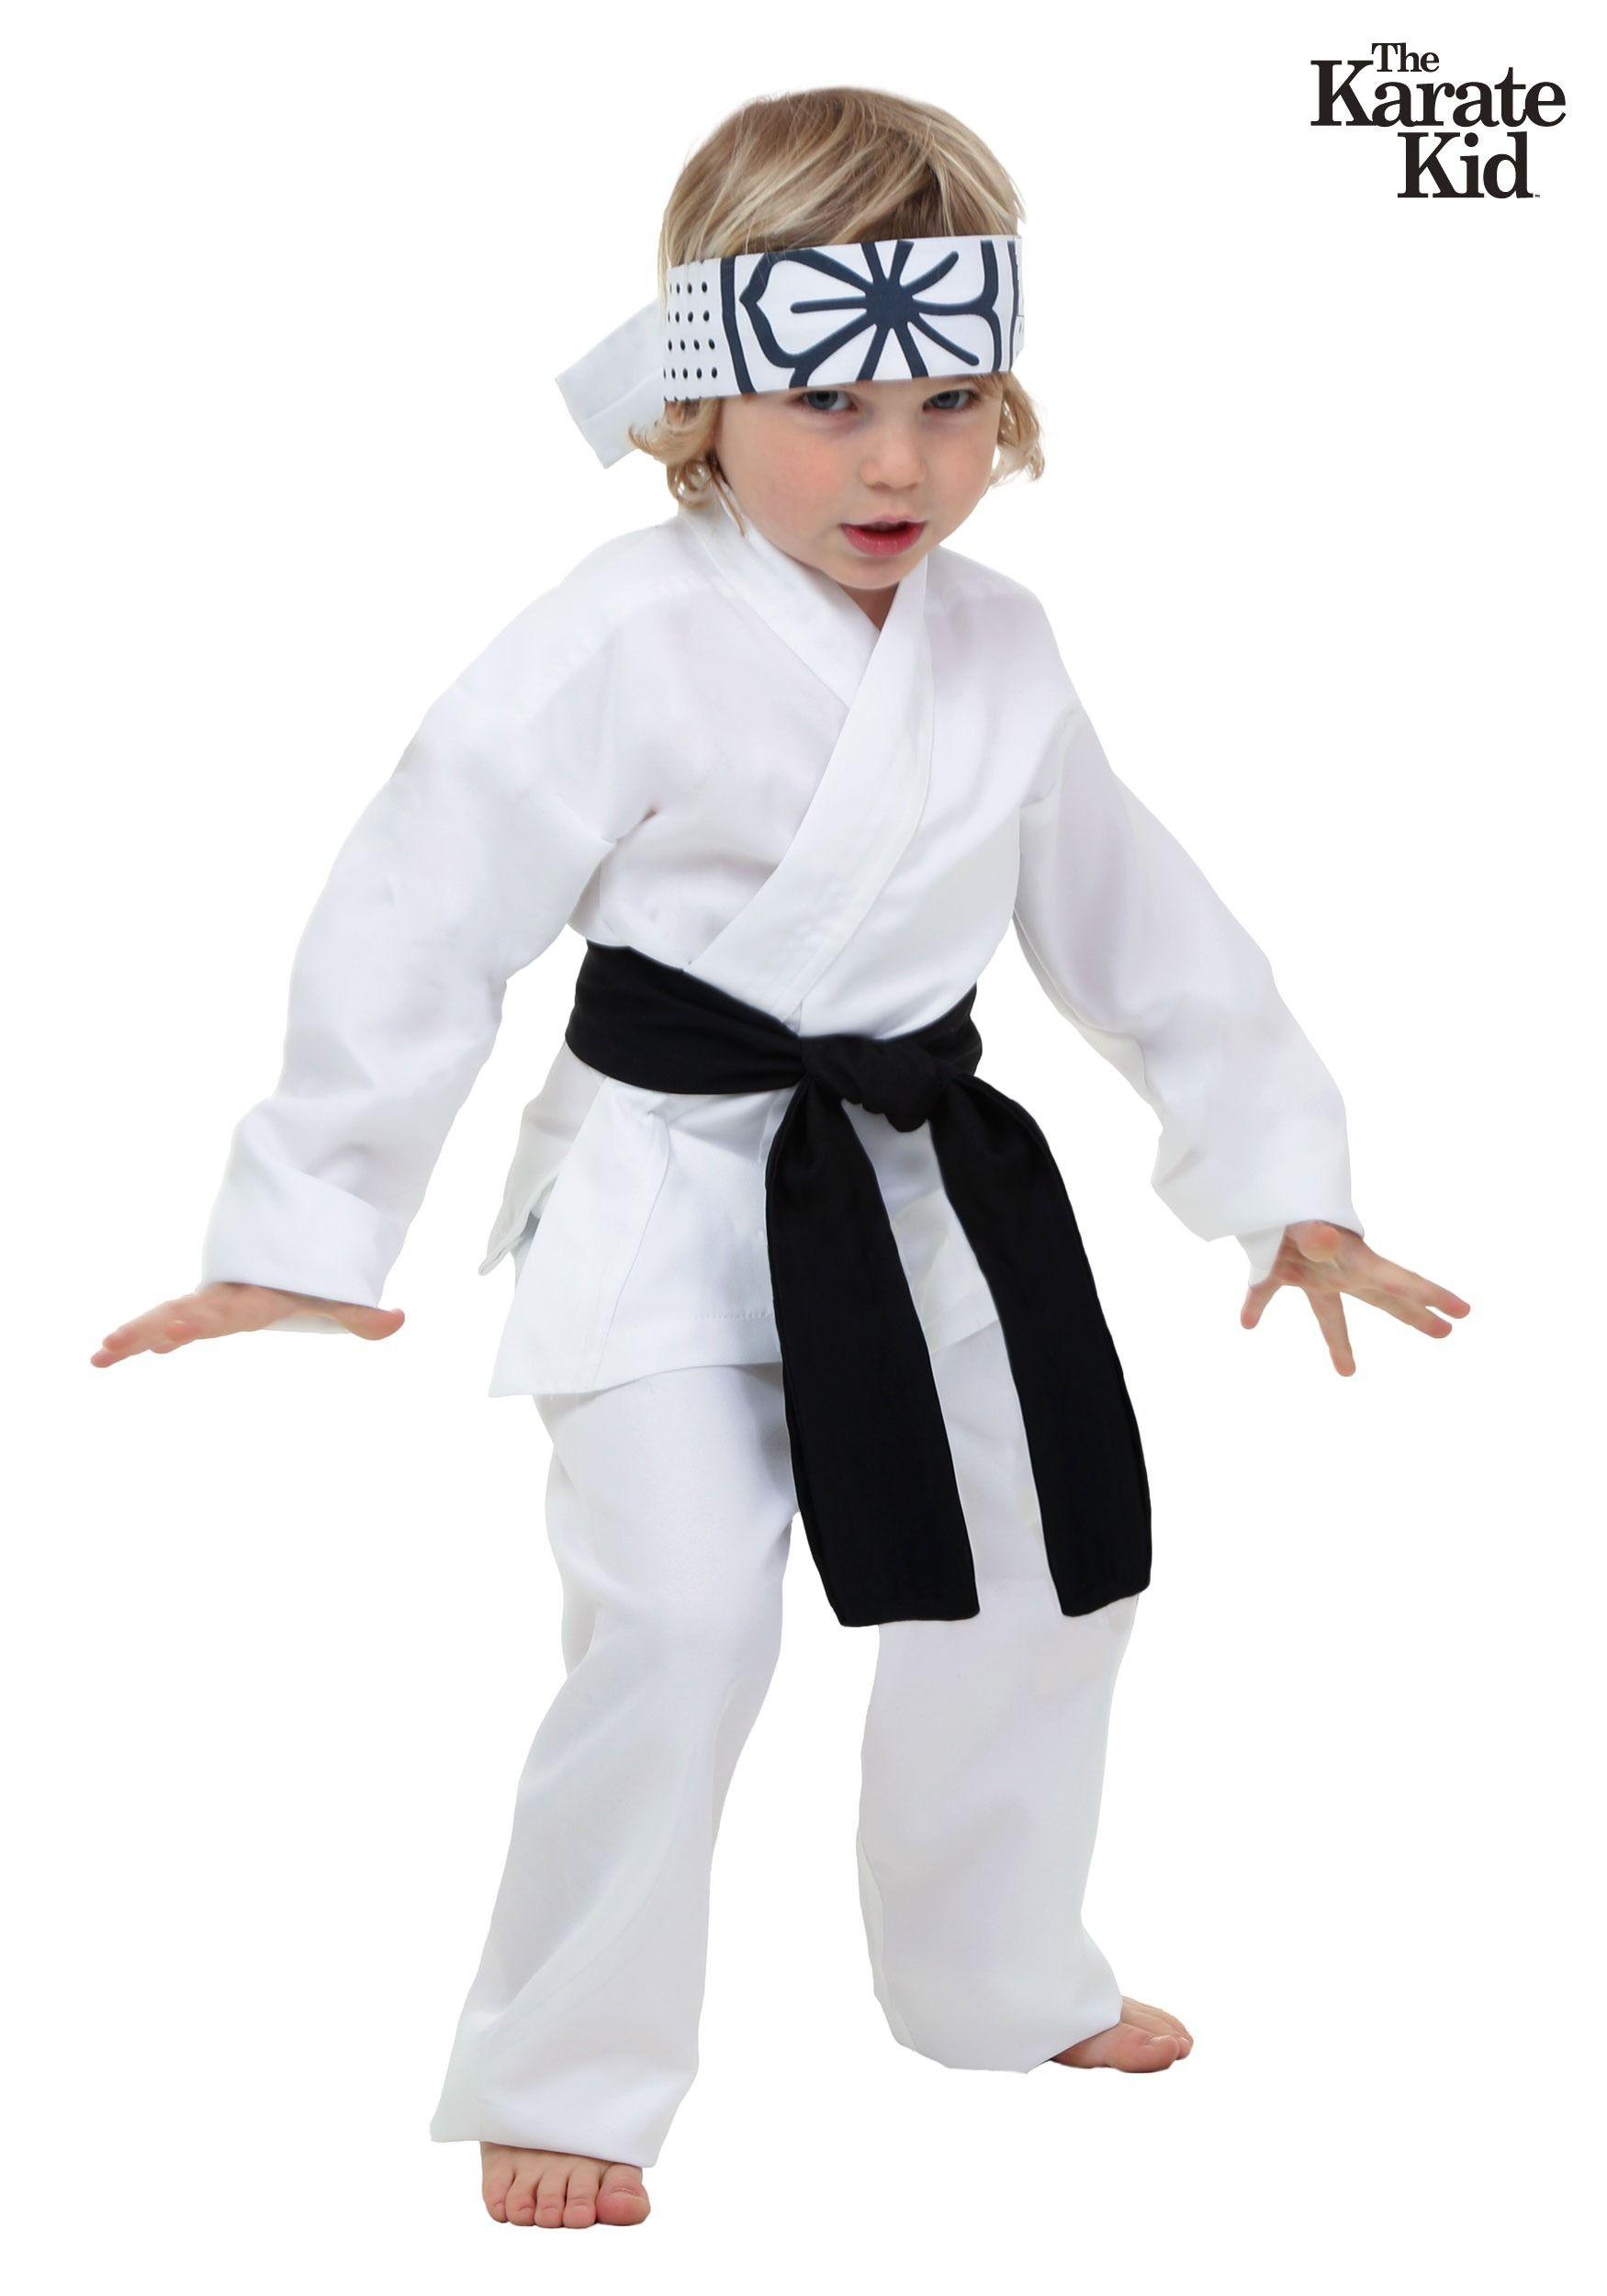 Toddler Daniel San Costume Halloween costumes for kids